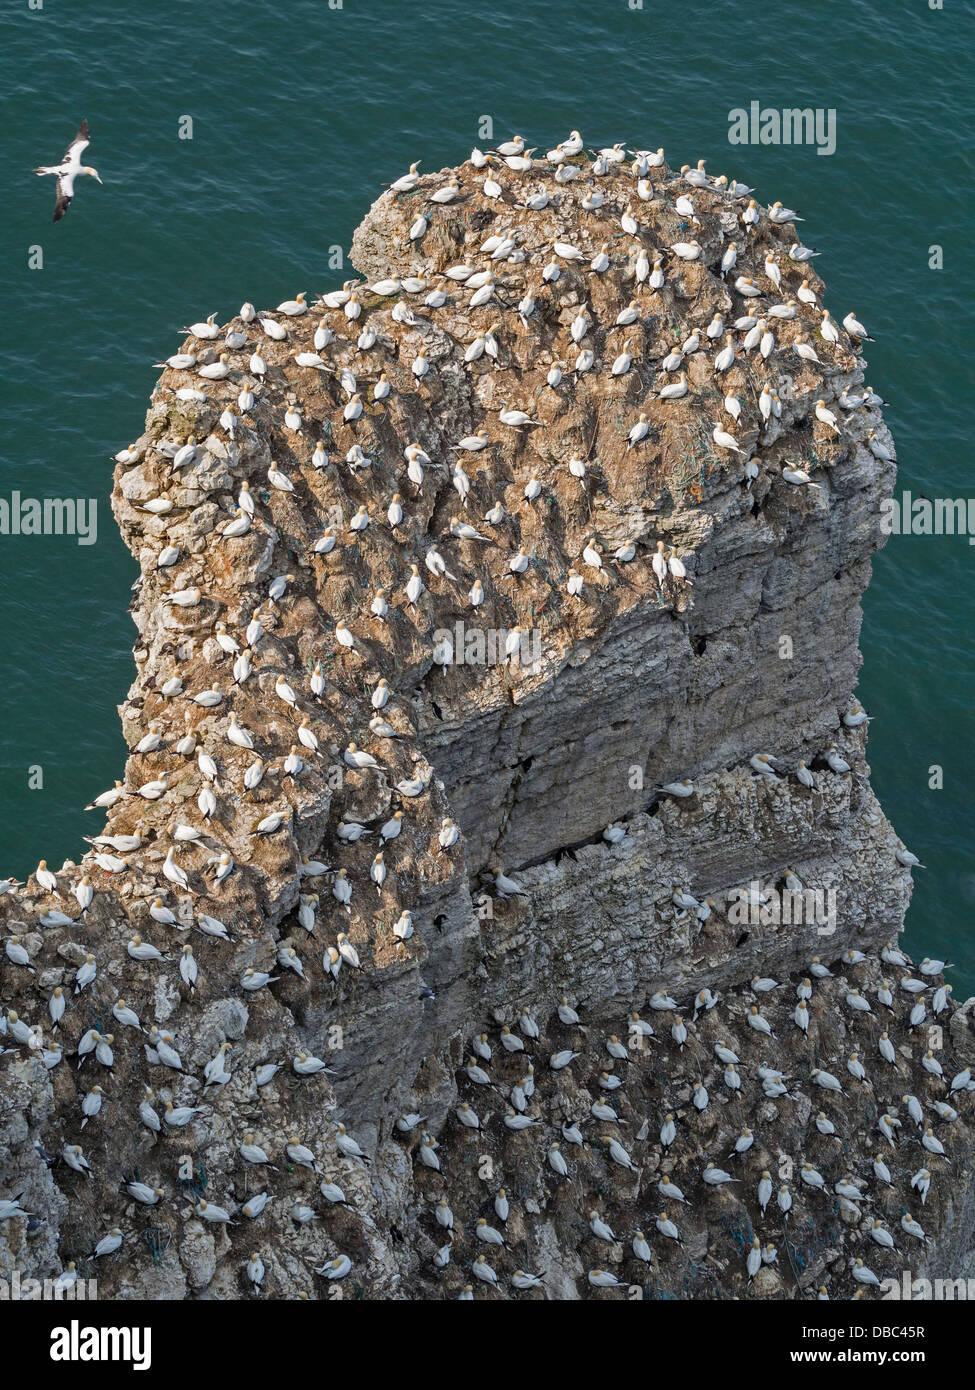 Gannets nesting at Bempton Cliffs East Yorkshire UK - Stock Image